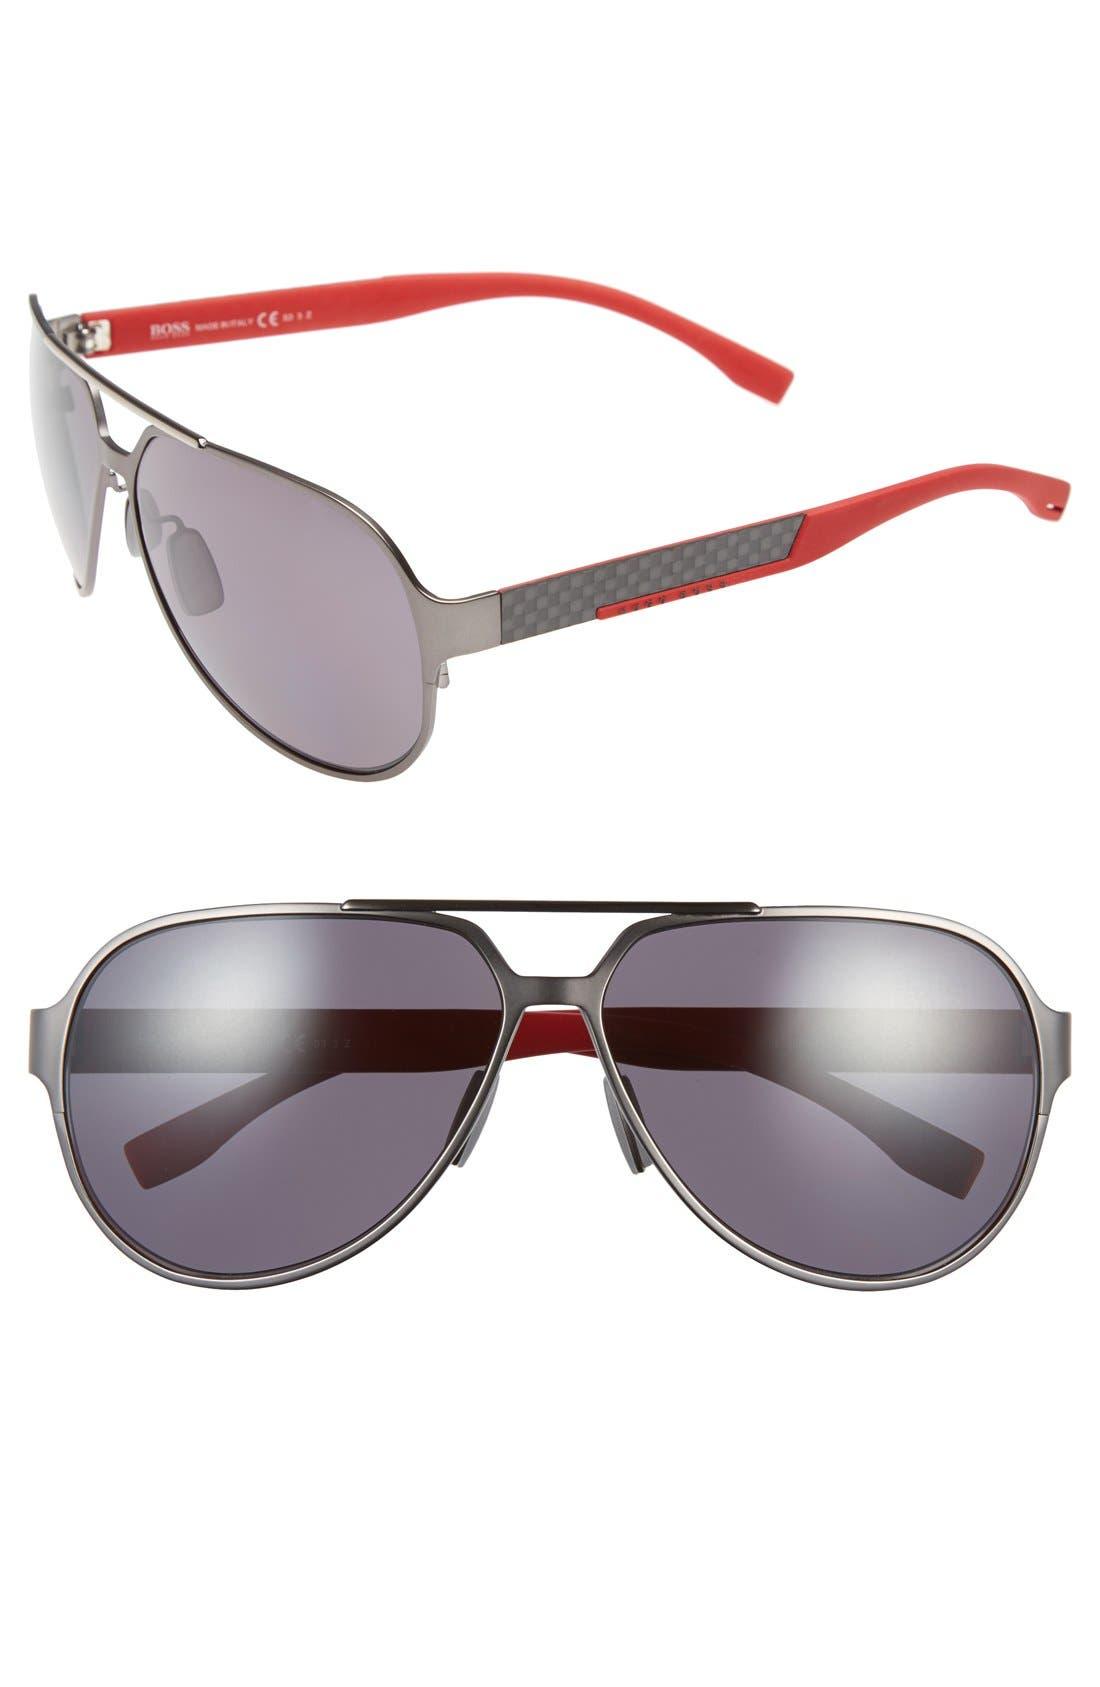 63mm Polarized Aviator Sunglasses,                         Main,                         color, 043